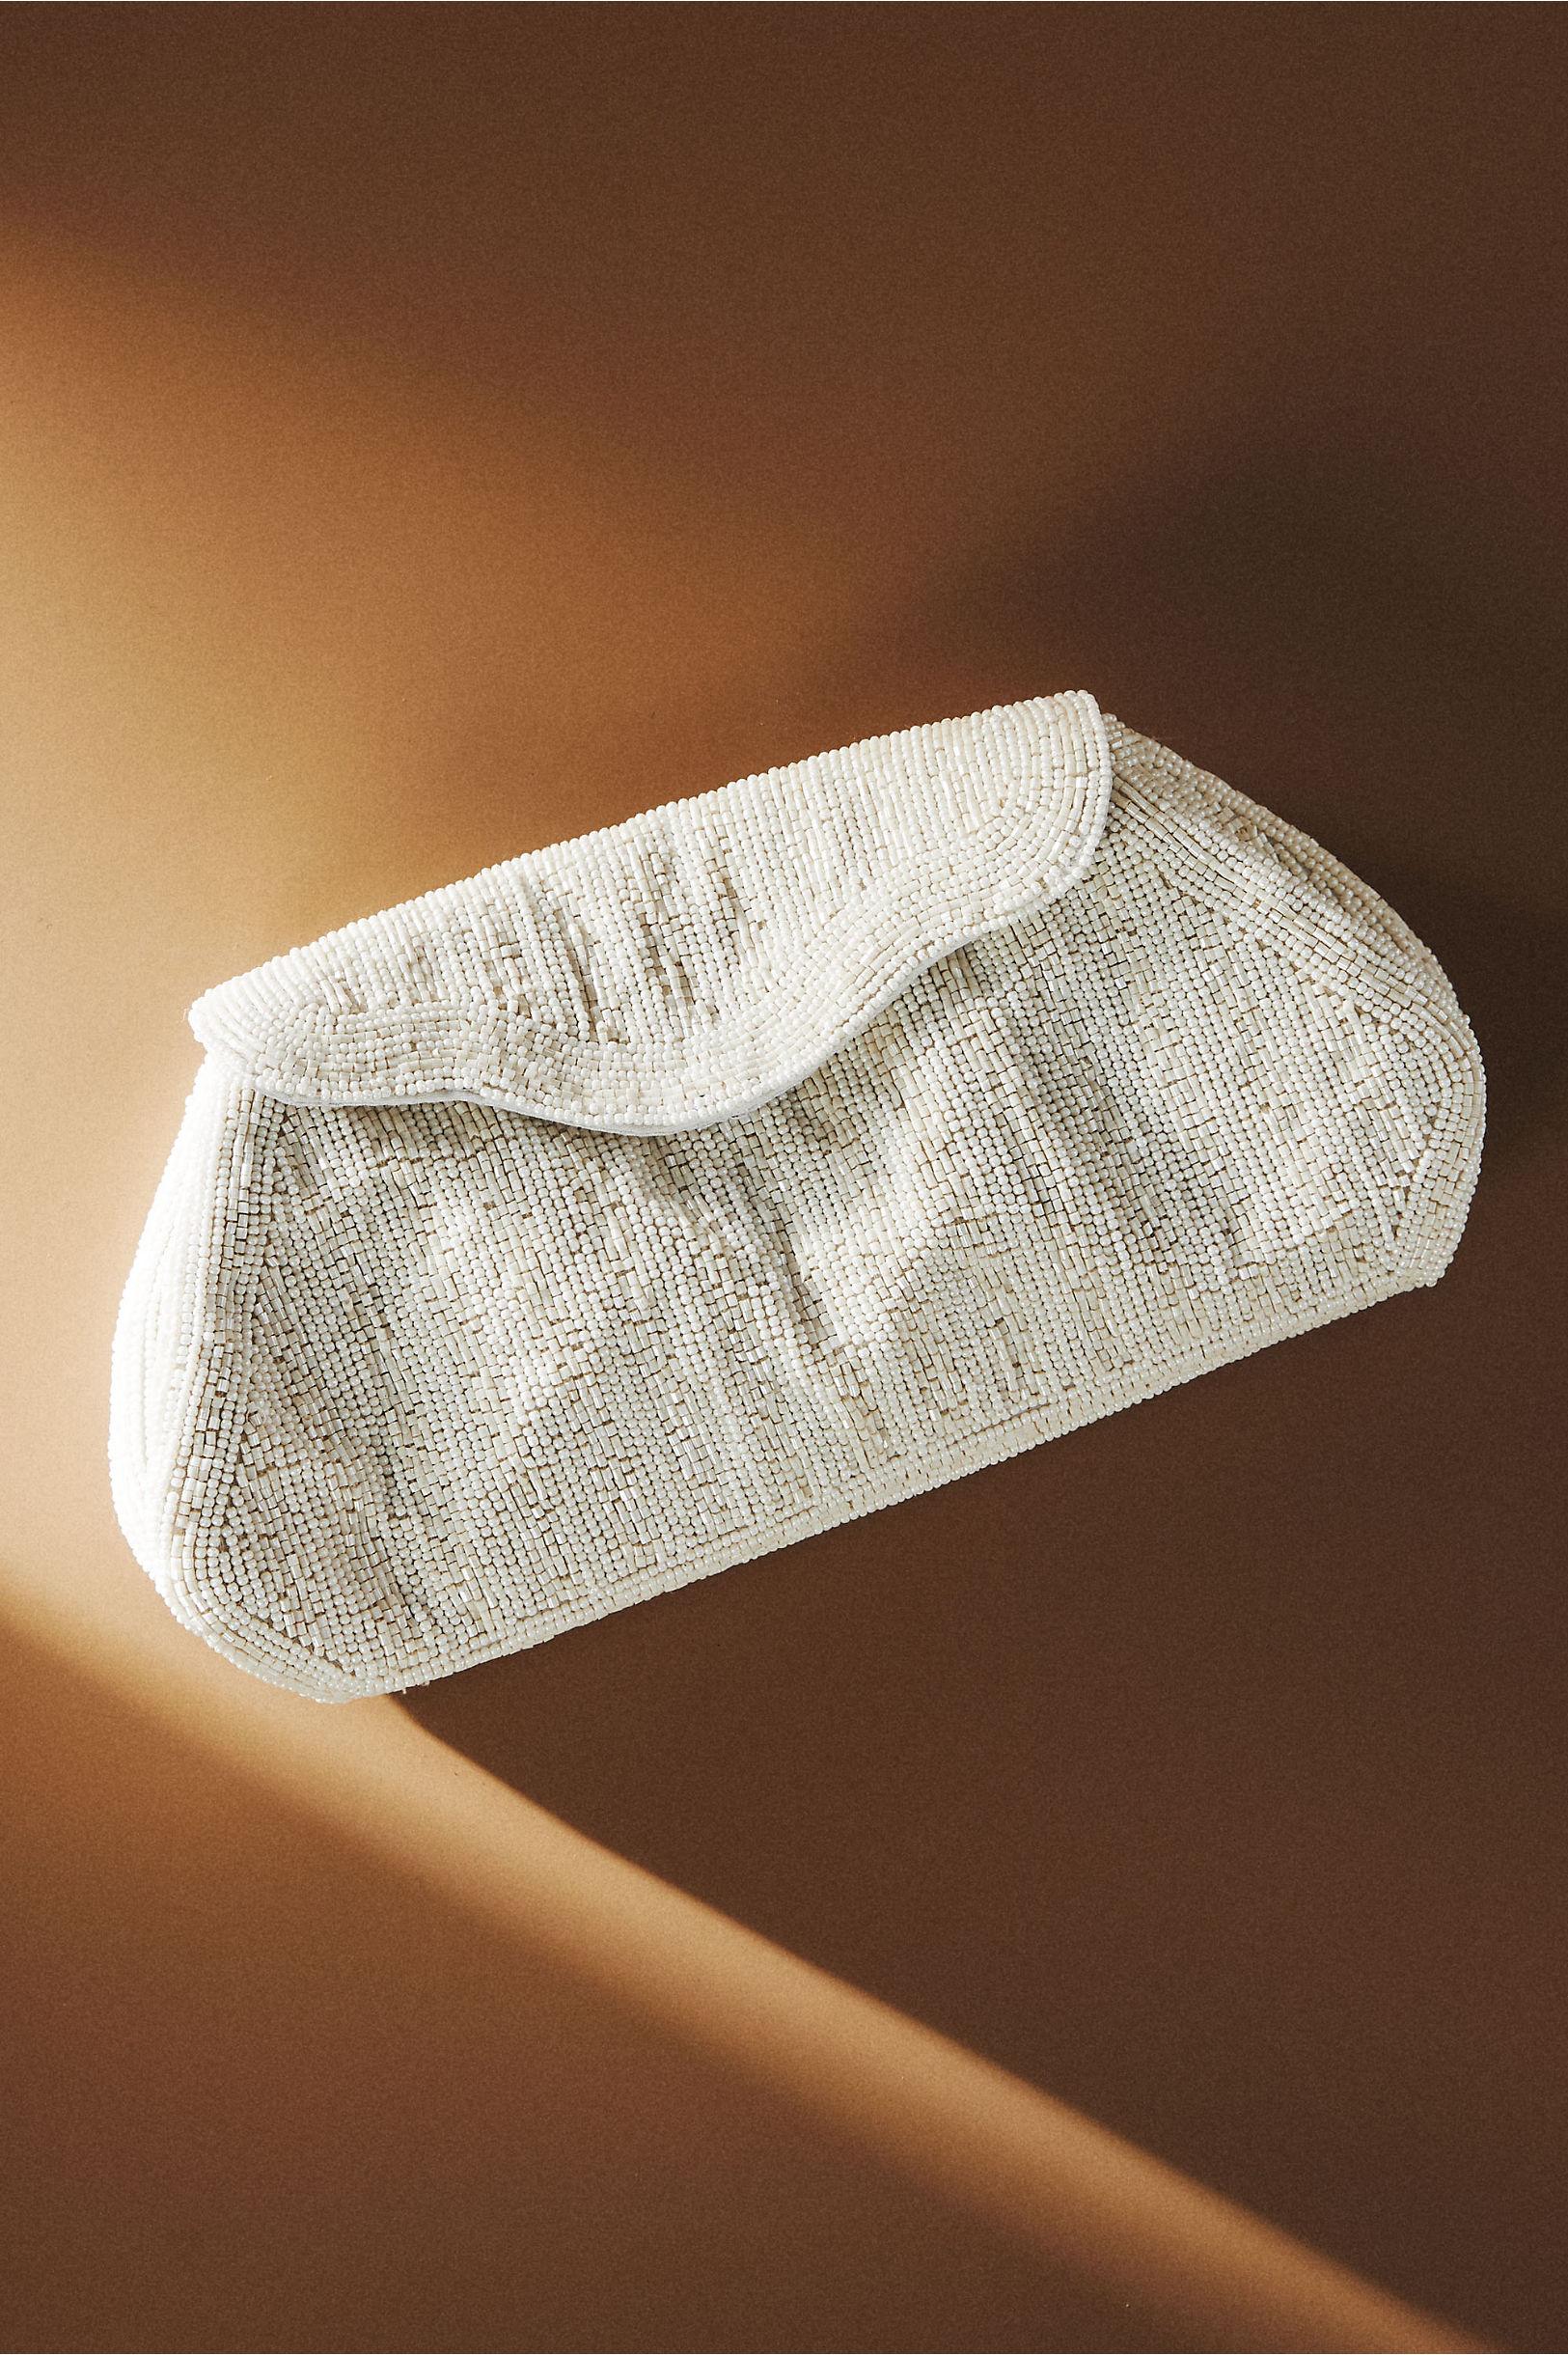 BHLDN Torelle Bag